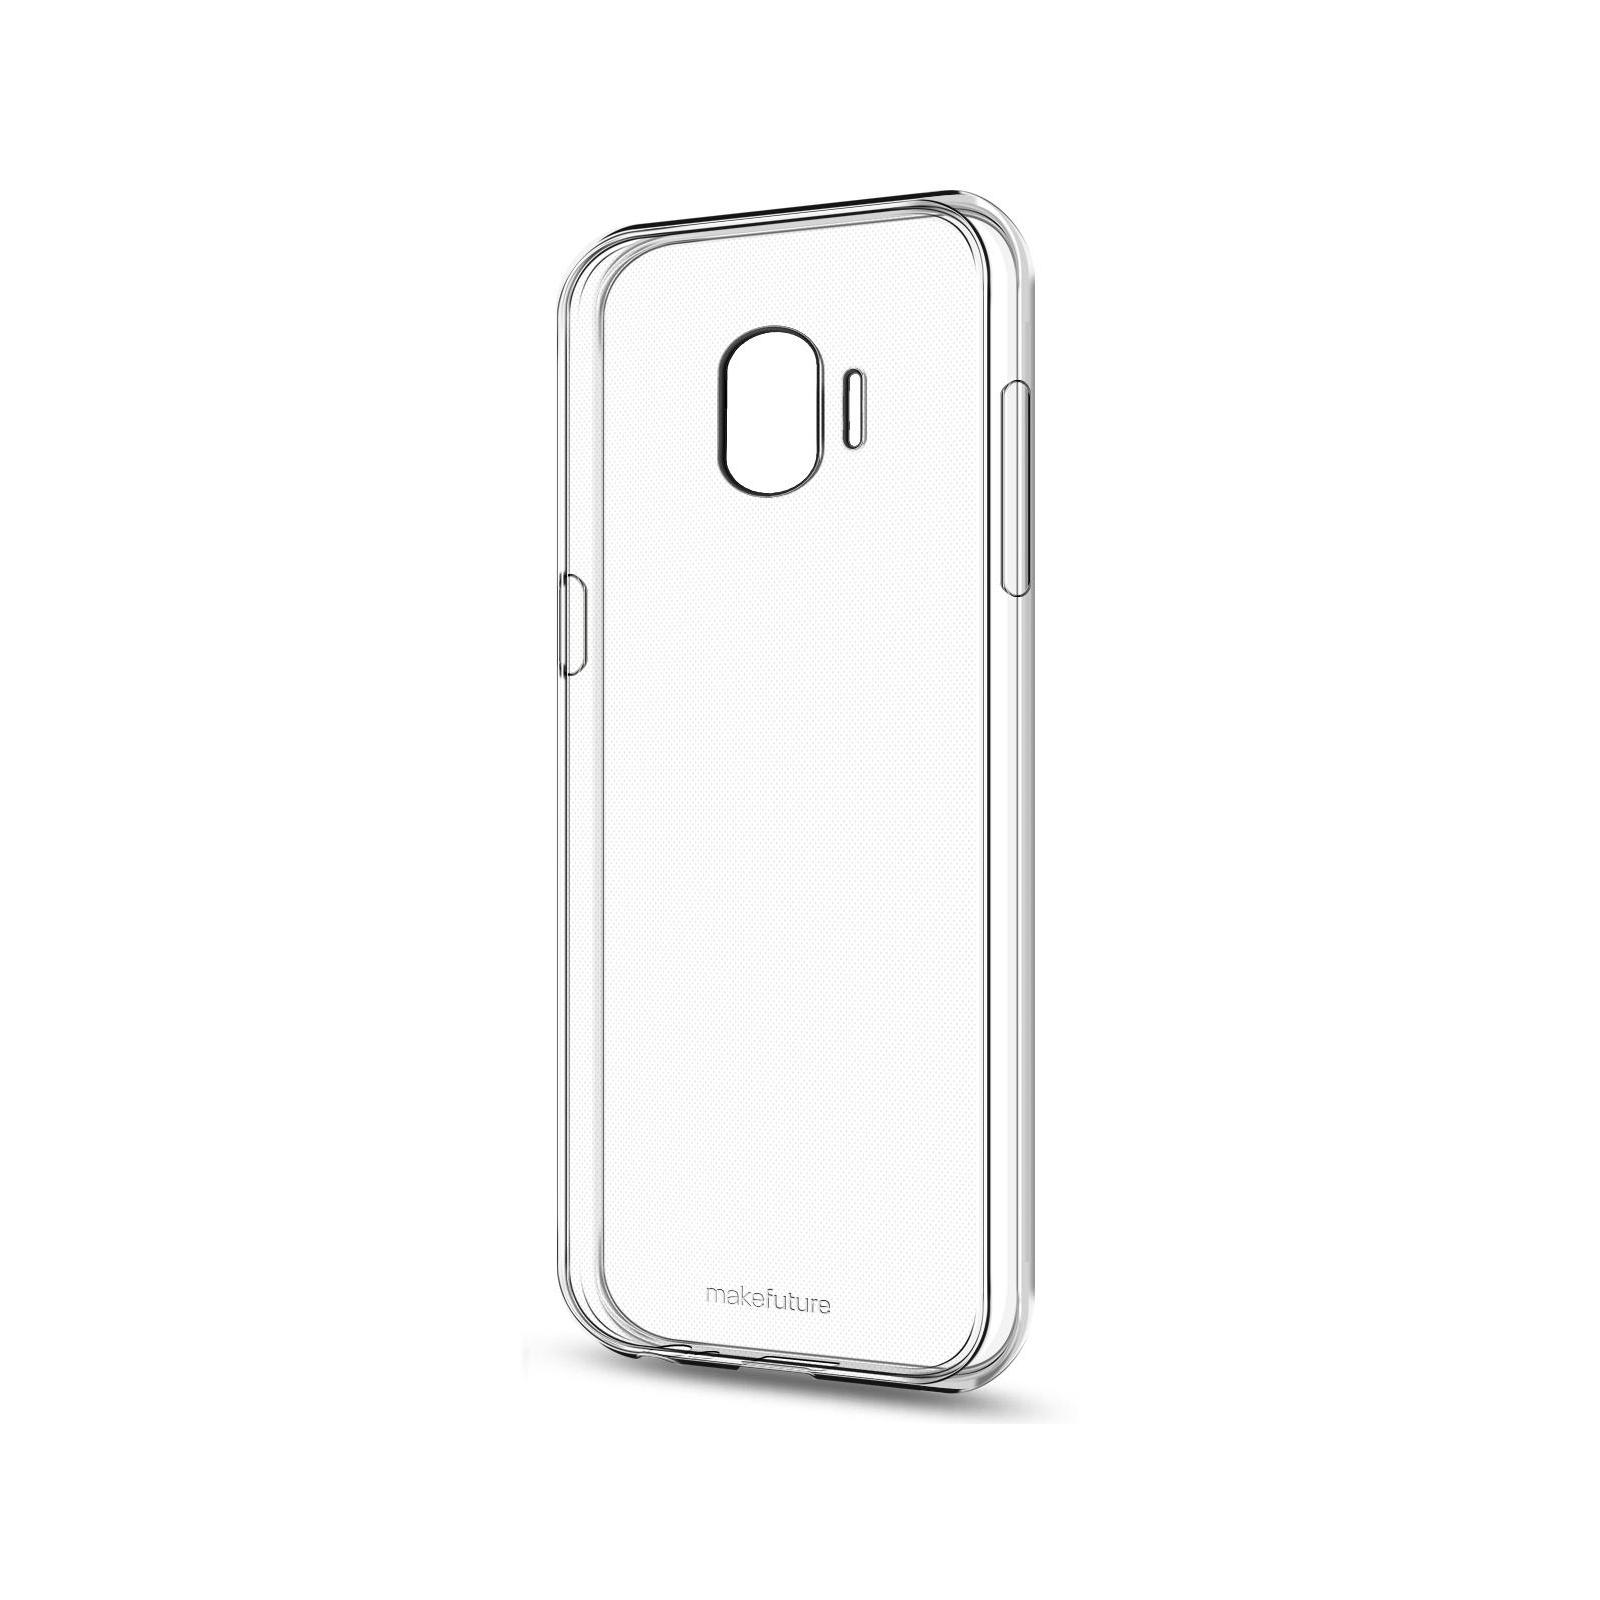 Чехол для моб. телефона MakeFuture Air Case (TPU) Samsung J2 Core Clear (MCA-SJ260CL)